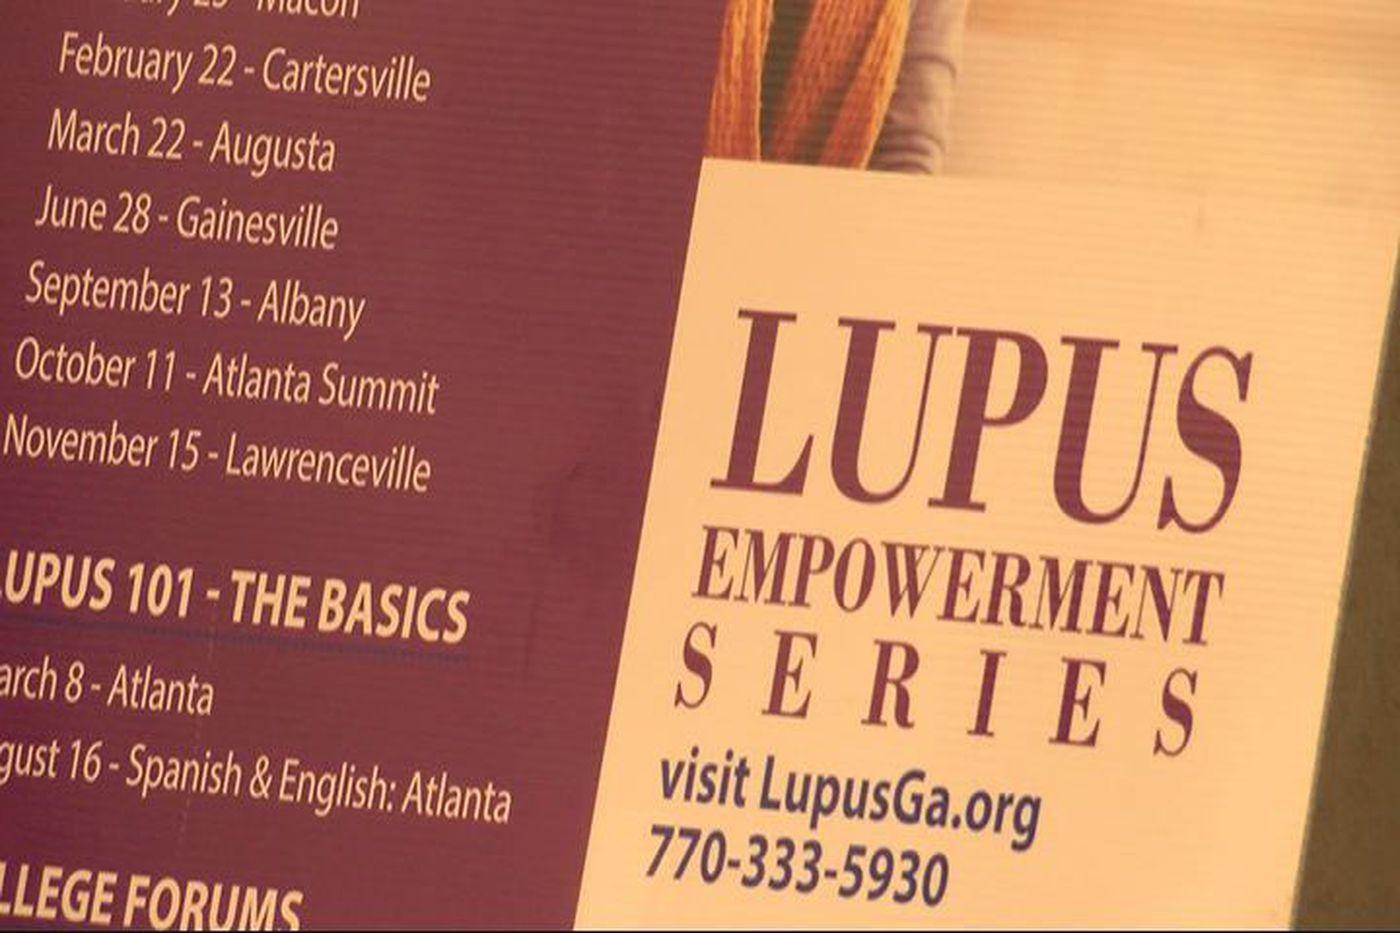 Darton hosts Lupus seminar